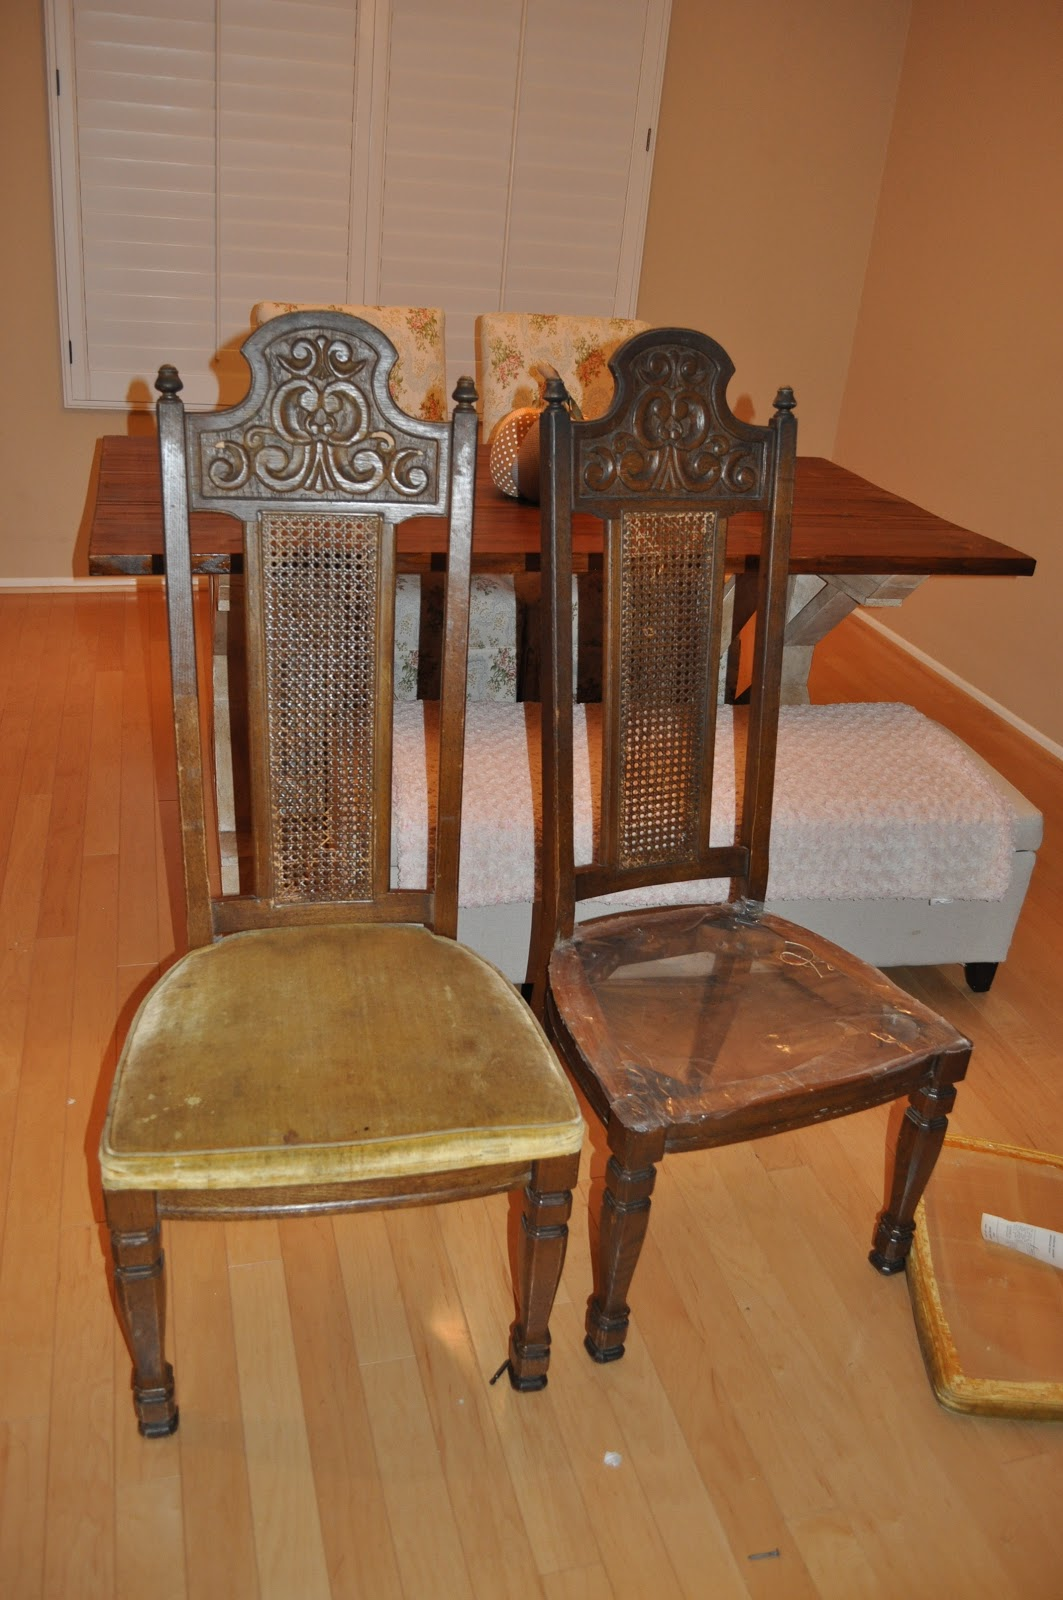 Diy Dining Chairs Sheboygan Chair Company 5 Redone A Boy Girl And 2 Mini